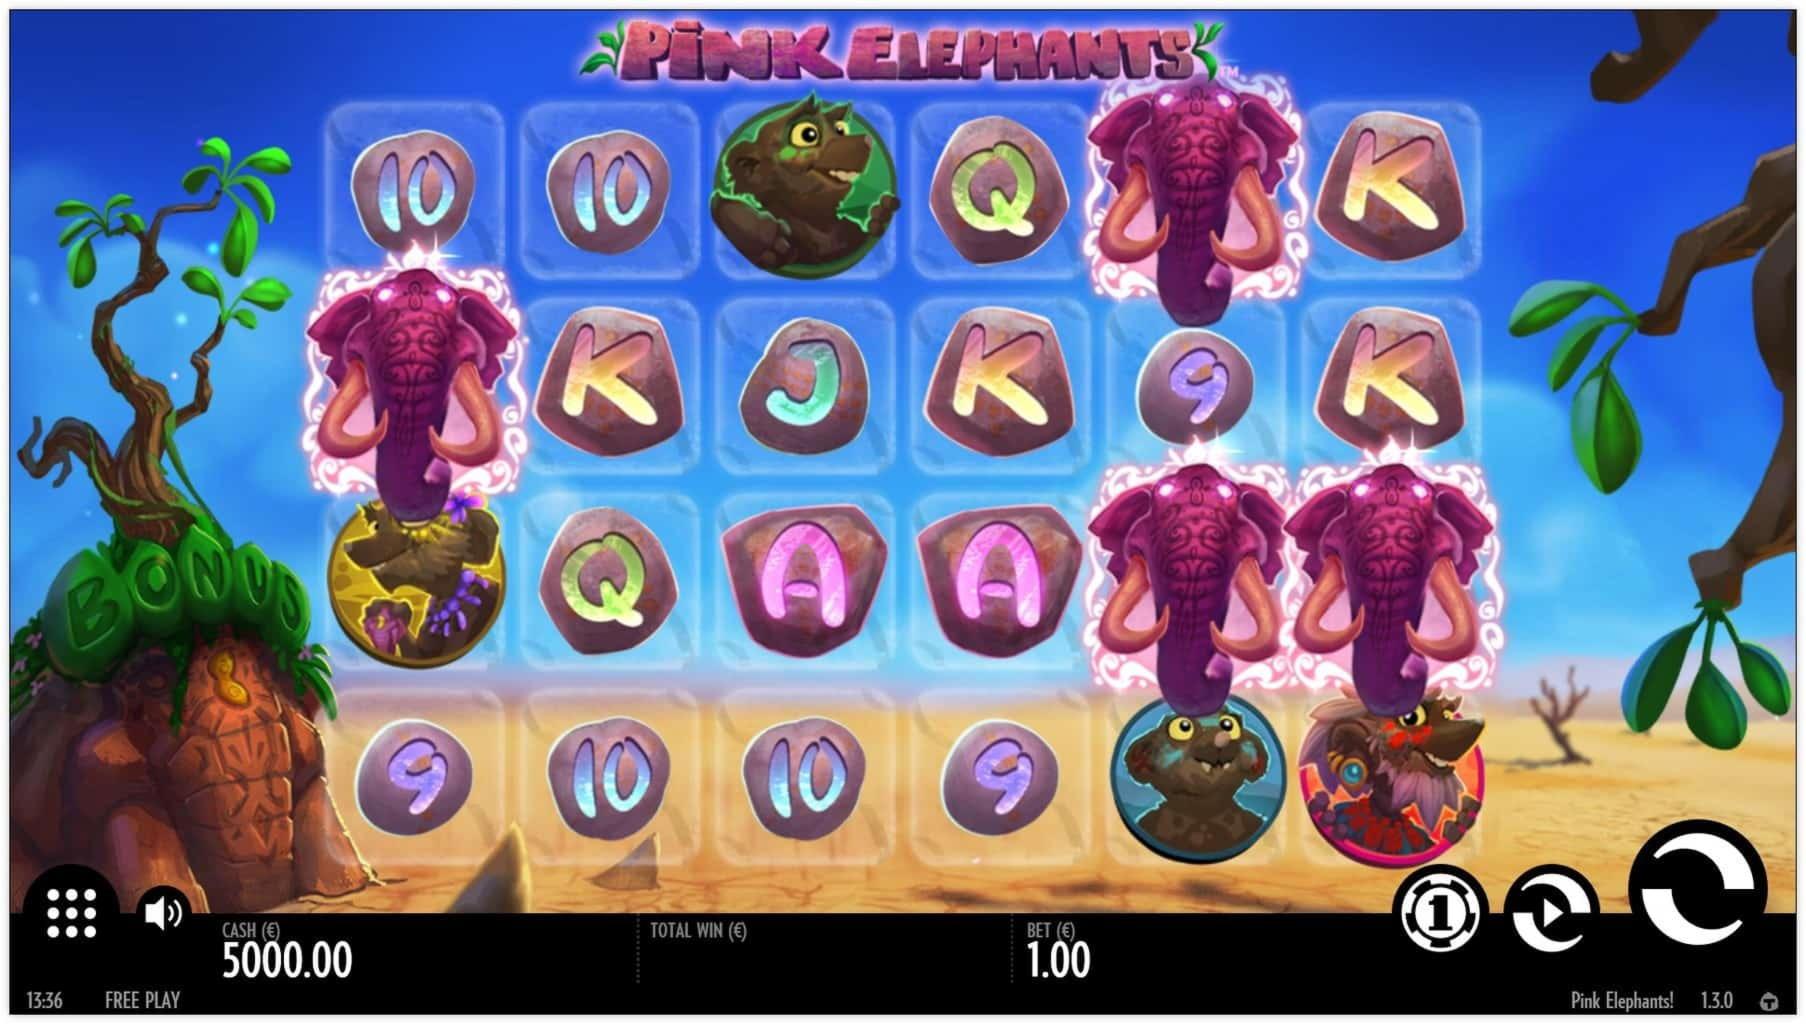 33 free spins no deposit casino at 777 Casino